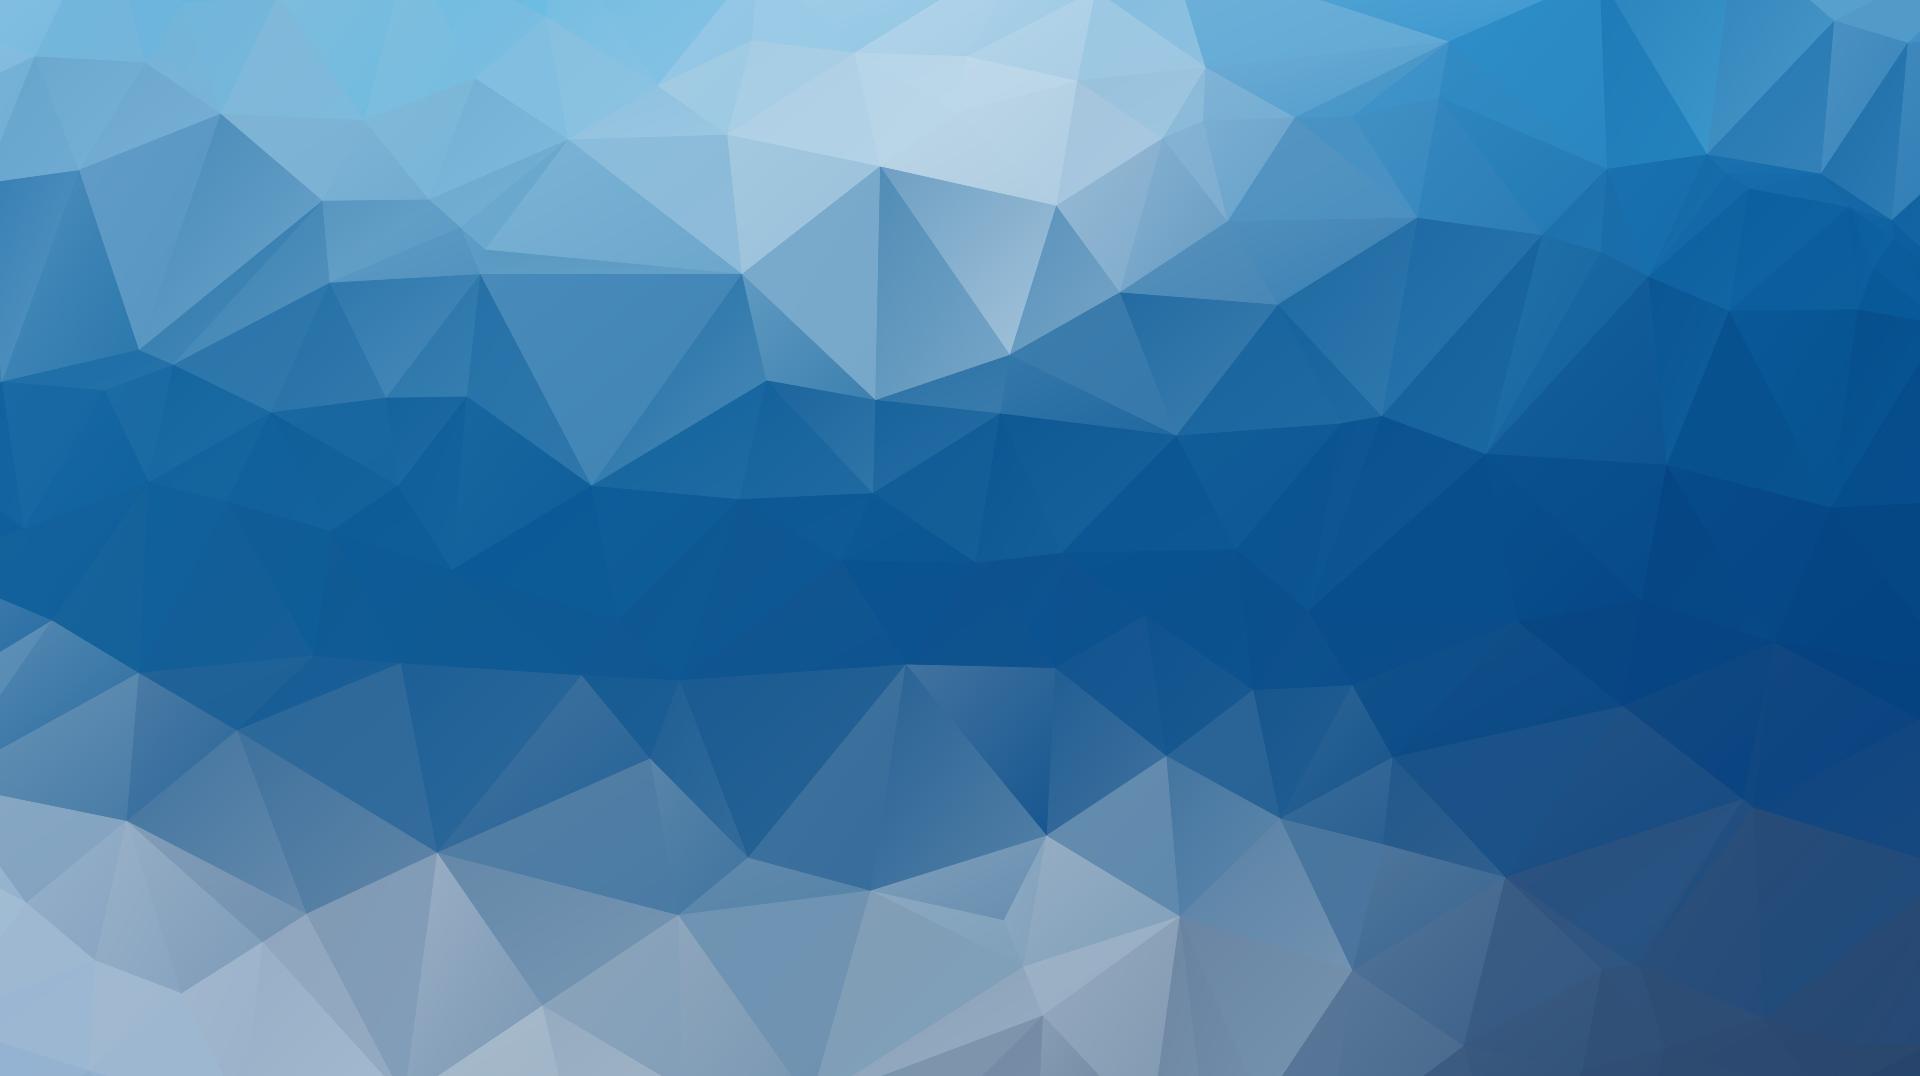 Unterseite Der Siebgewebe Dreiecke Polygone Blau